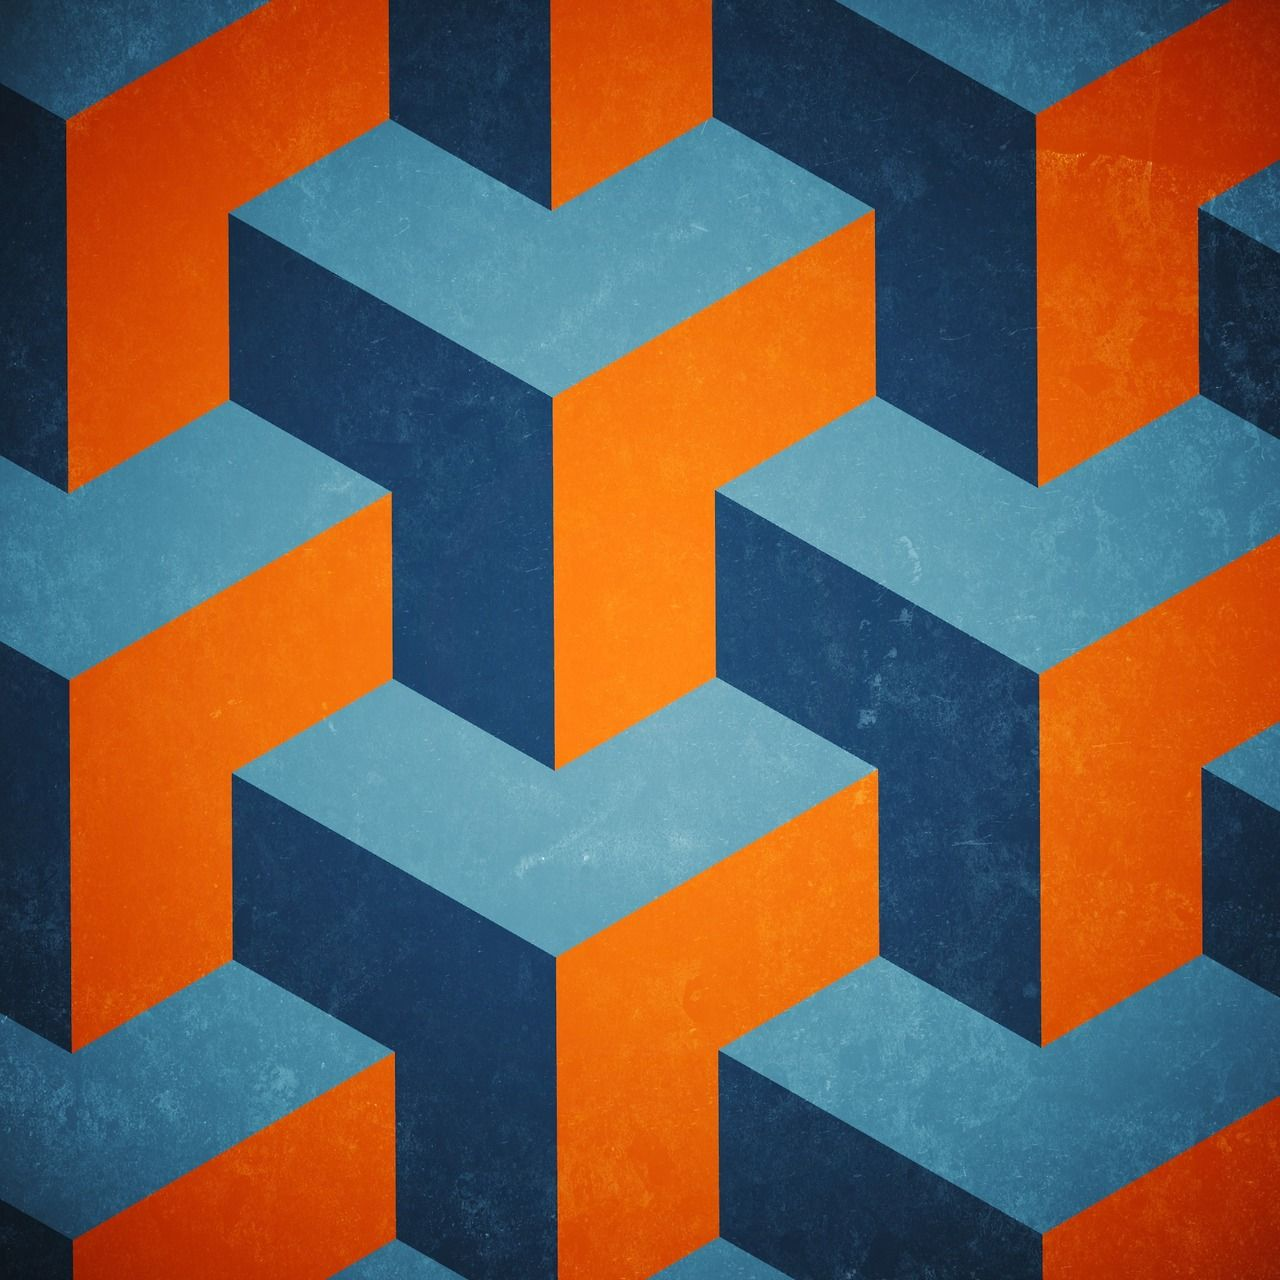 Seamless isometric graphic pattern | Patterns & Prints ...